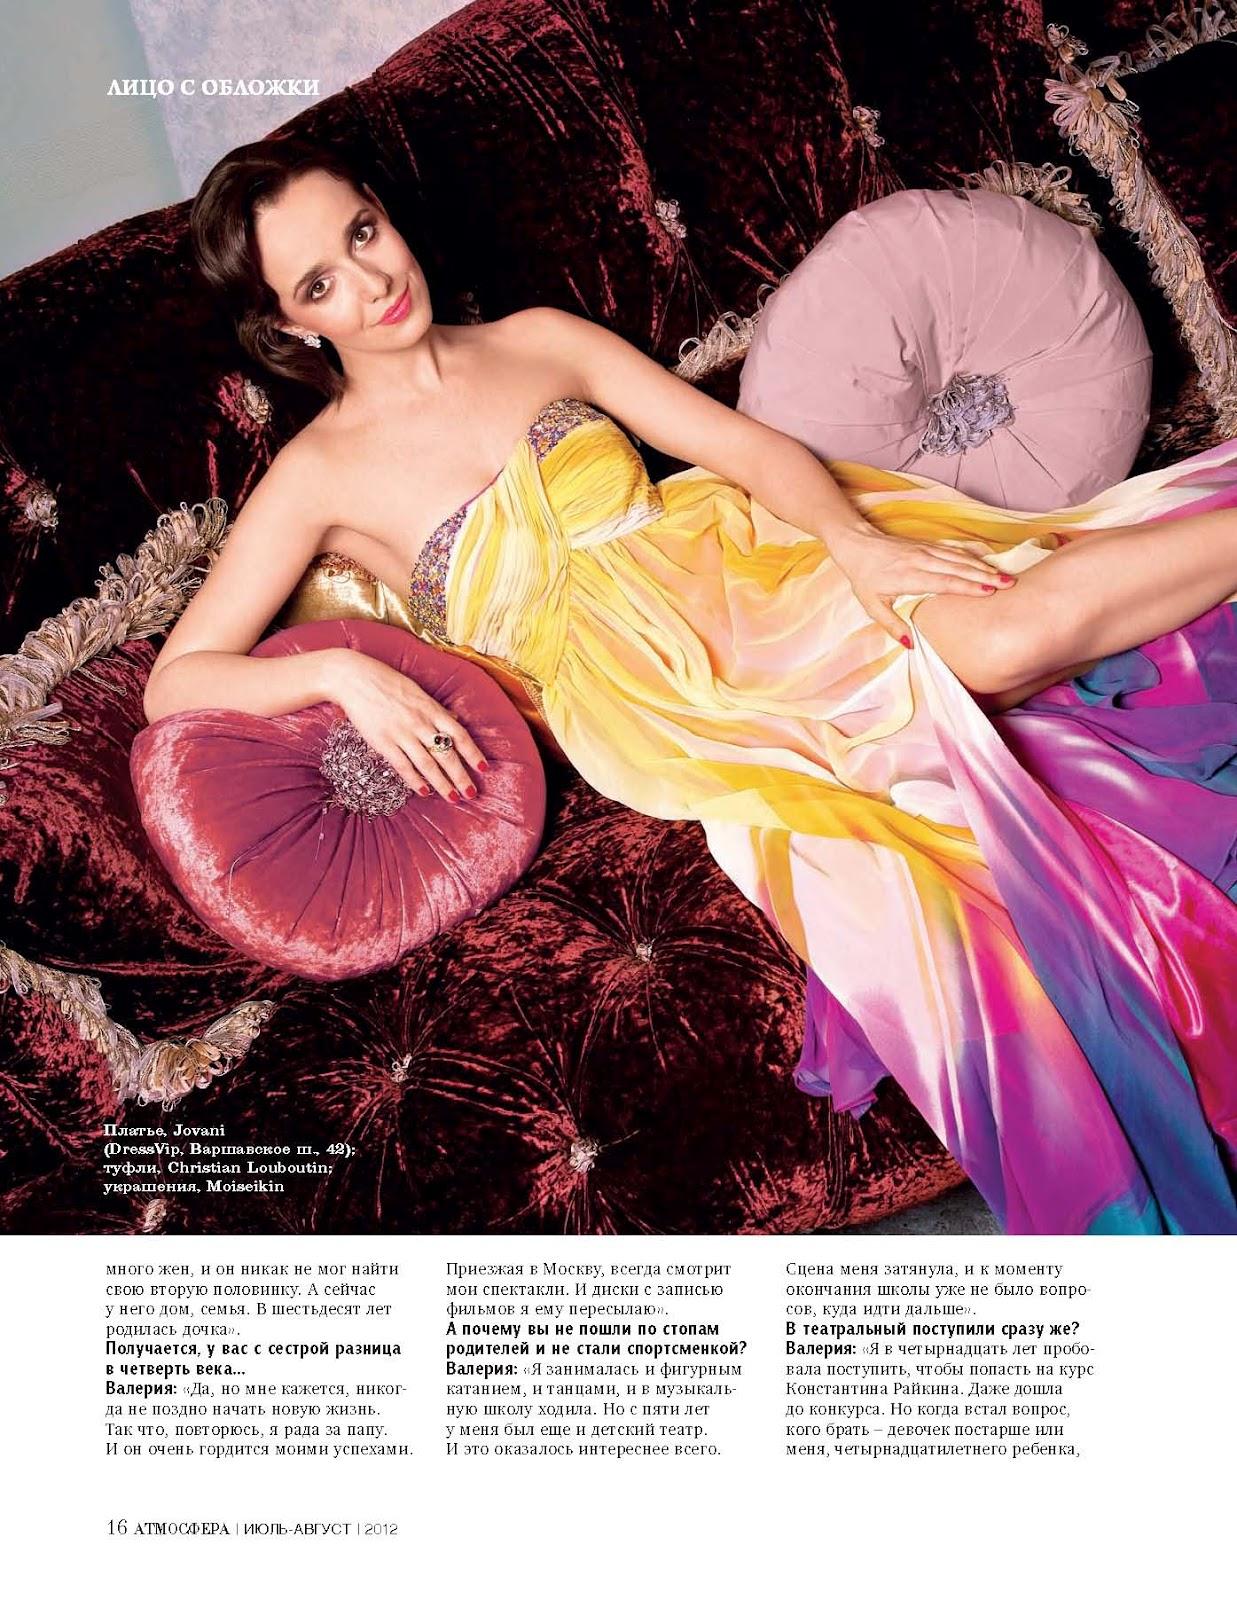 Юлия зимина фото в журнале 16 фотография